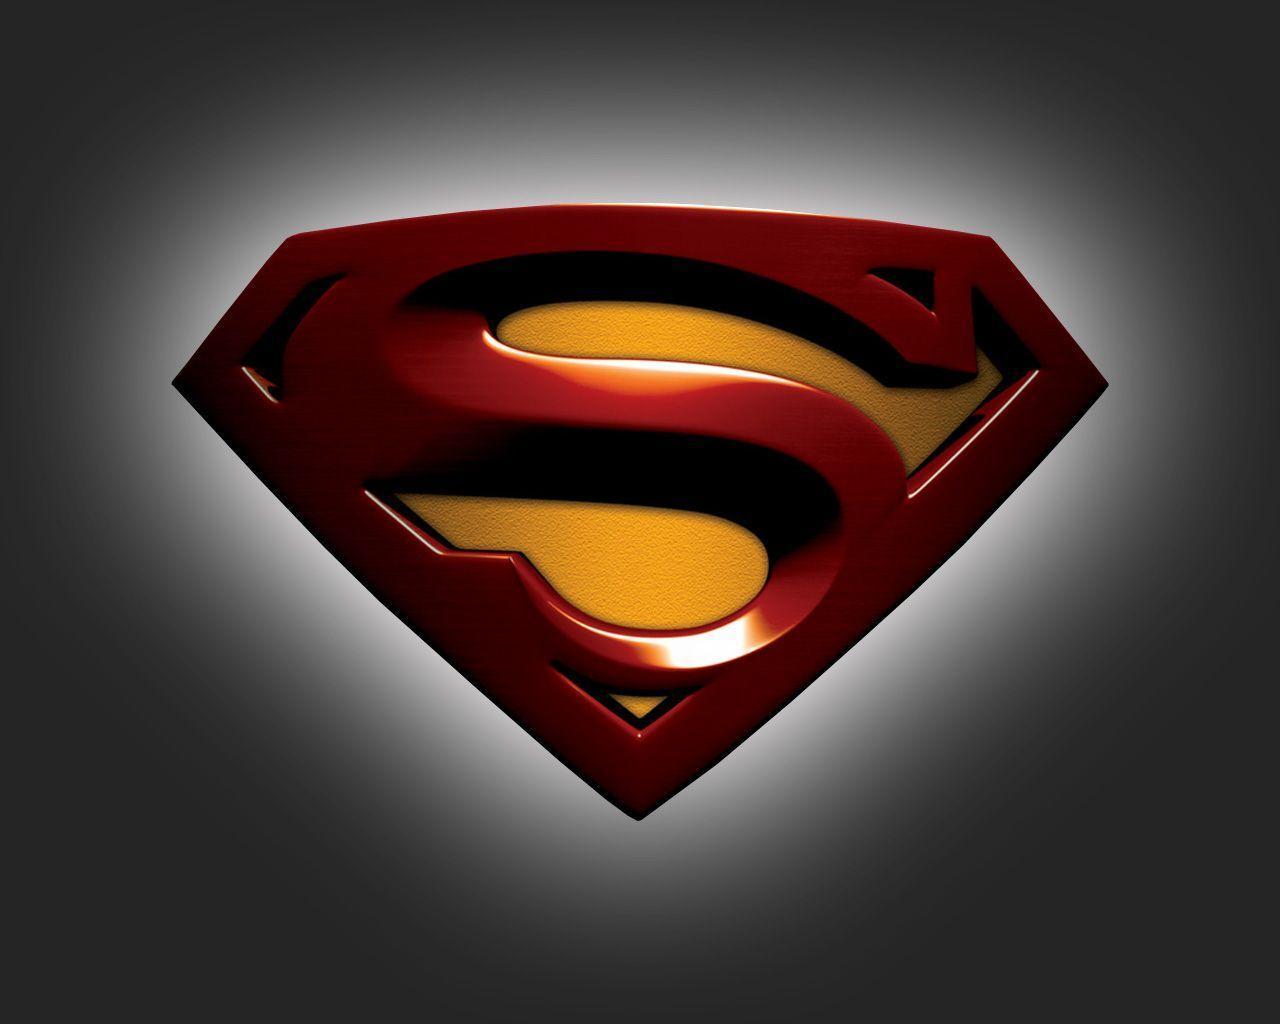 evil superman wallpaper hd - photo #44